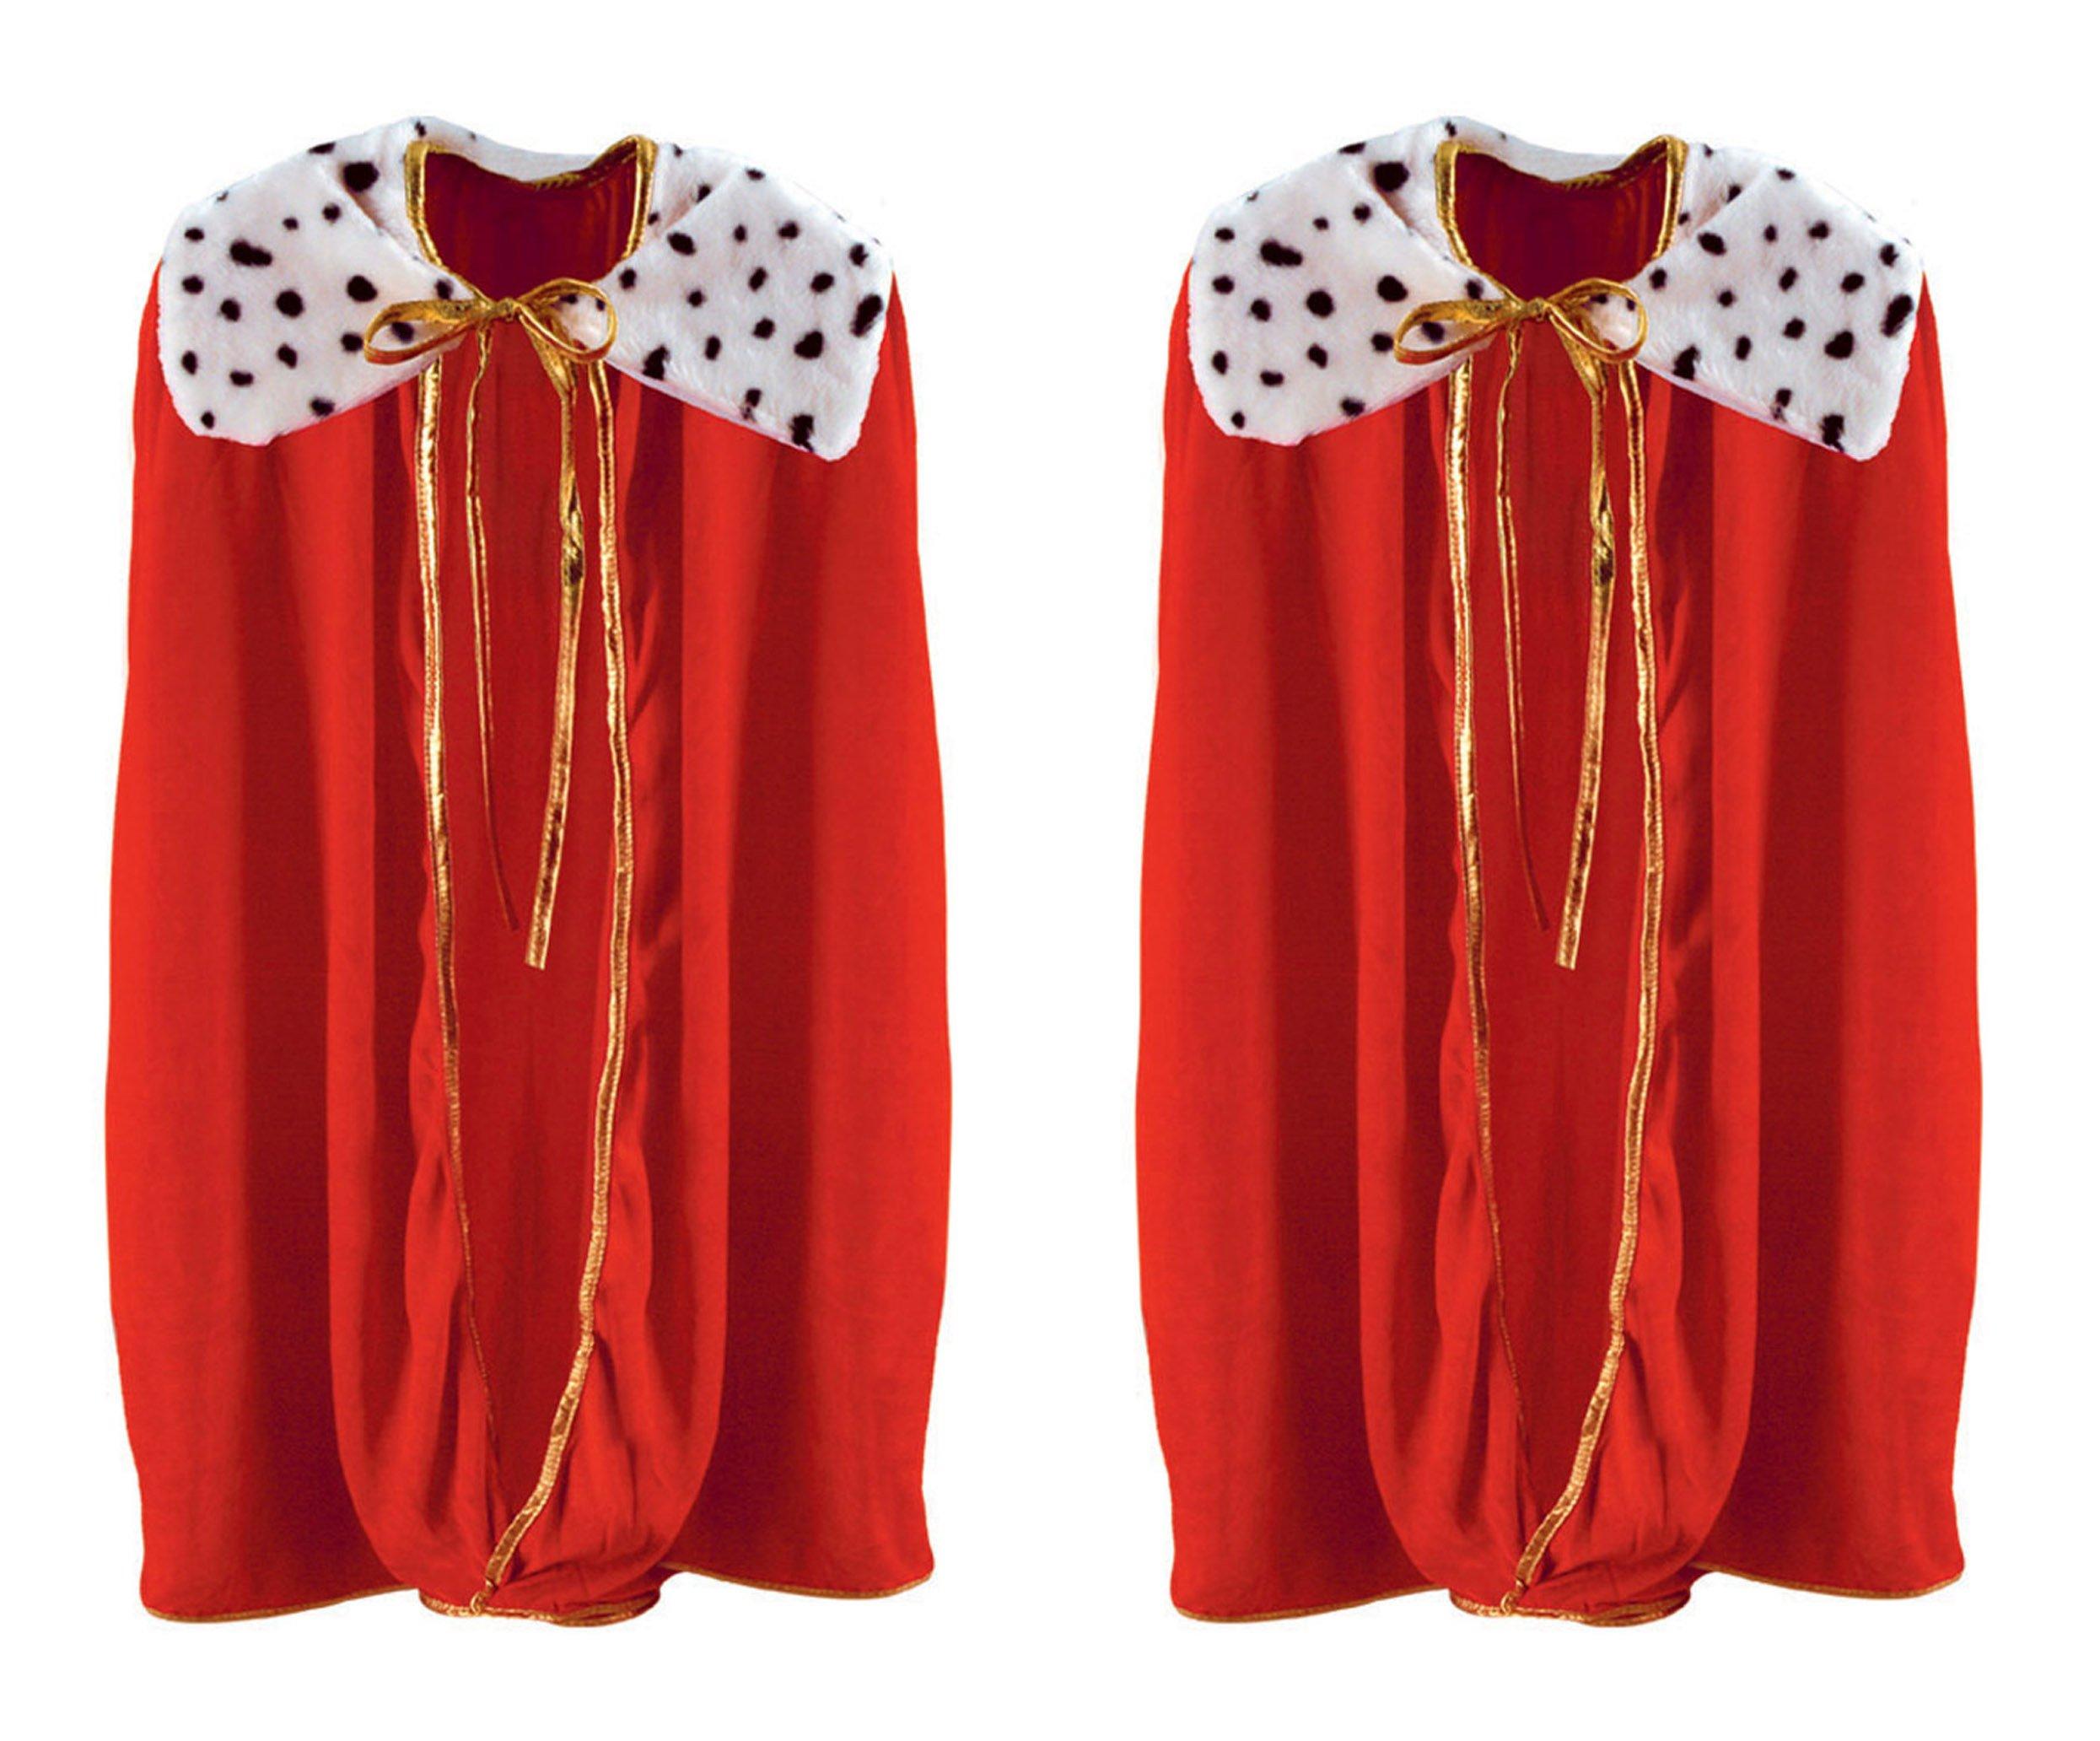 Beistle S60254AZ2 Child Sized Robe, Red/Black/White by Beistle (Image #1)